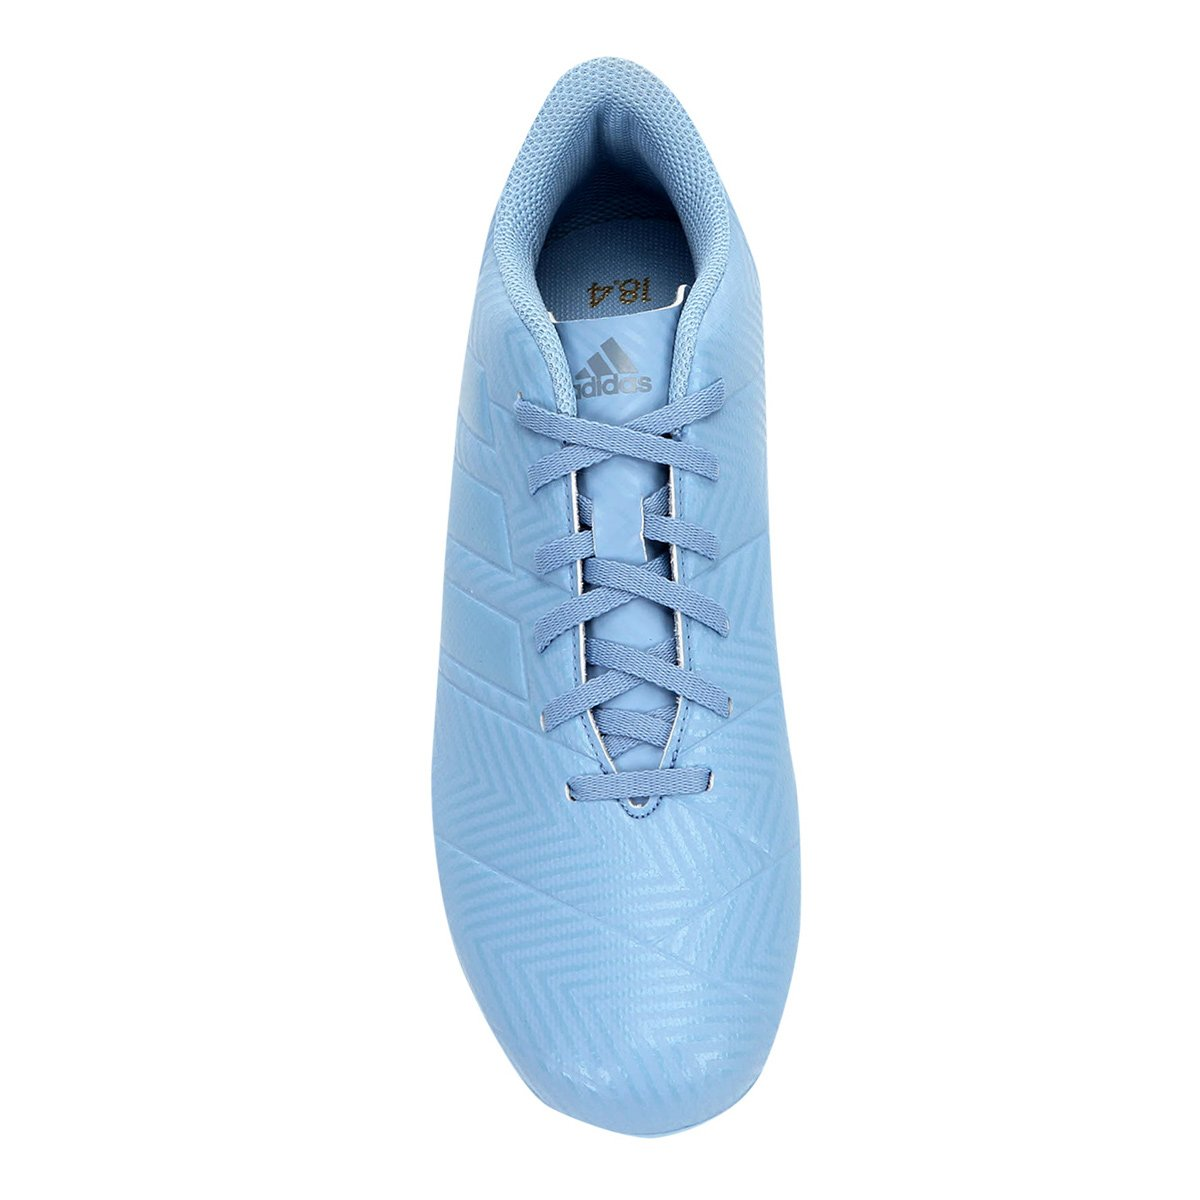 Chuteira Campo Adidas Nemeziz Messi 18 4 FG Masculina - Compre Agora . 5e46f6298a844